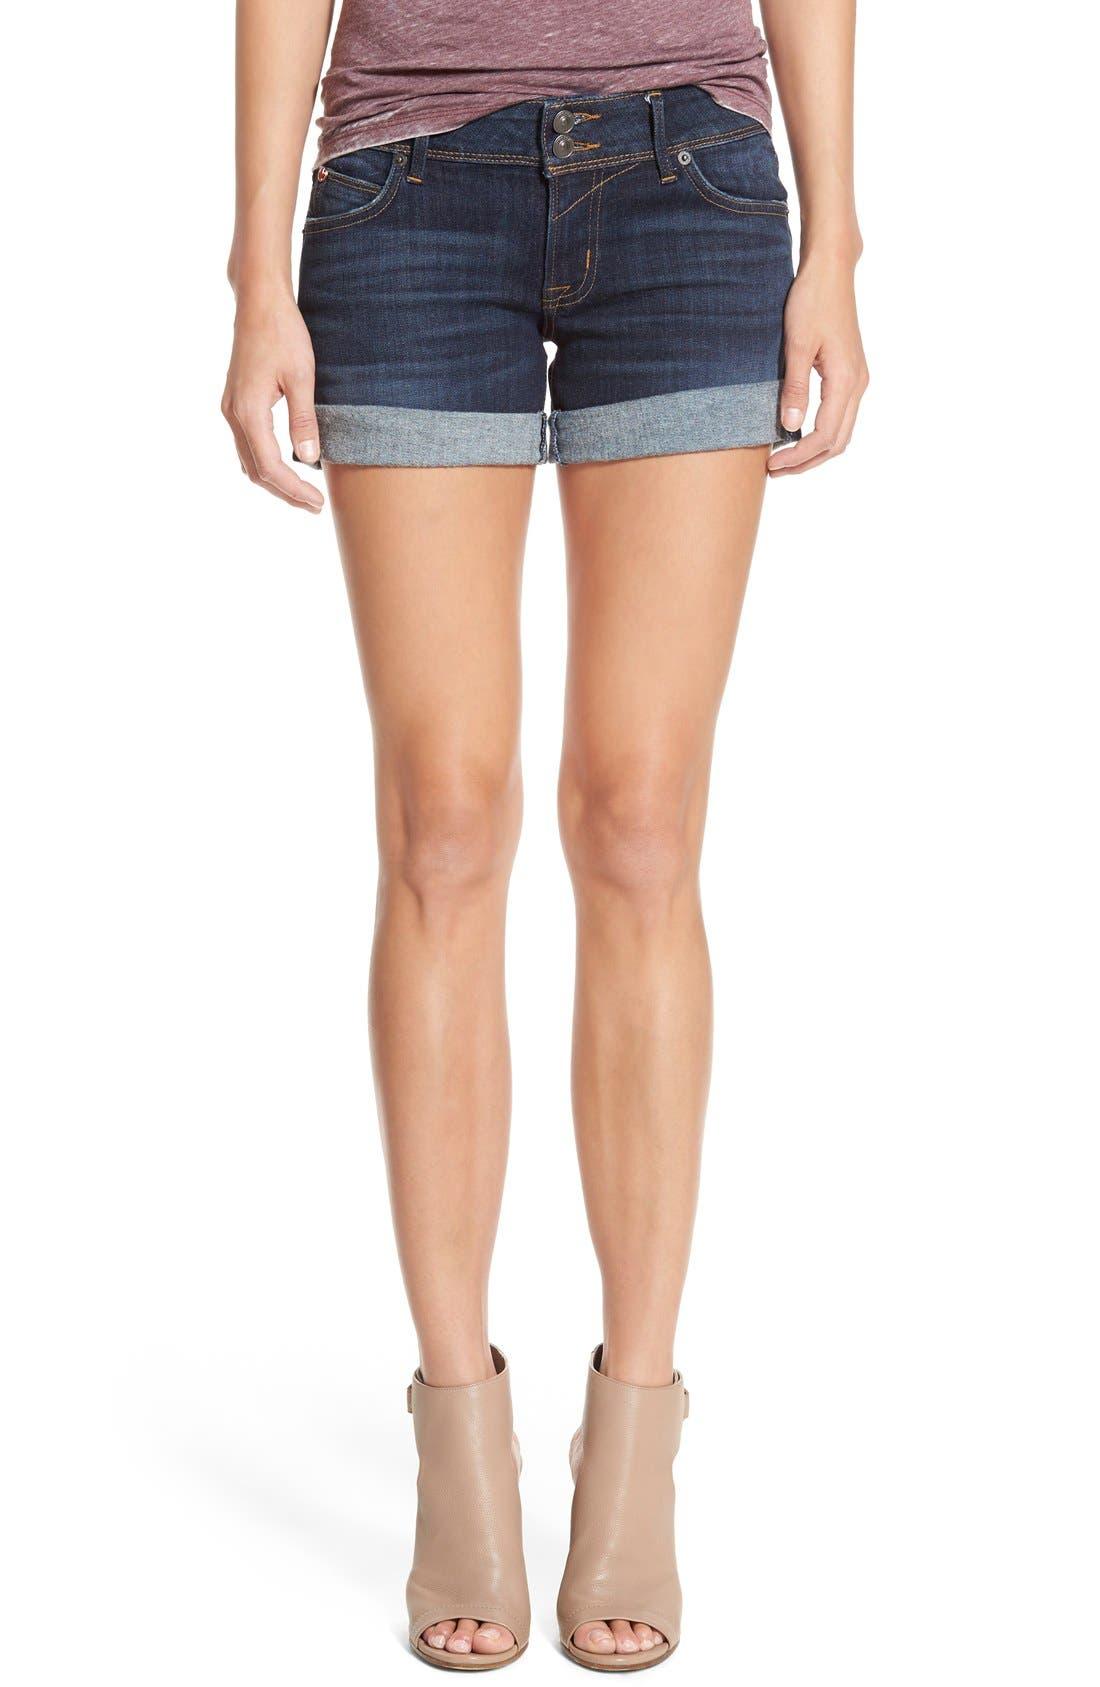 Alternate Image 1 Selected - Hudson Jeans 'Croxley' Cuffed Denim Shorts (Elemental)